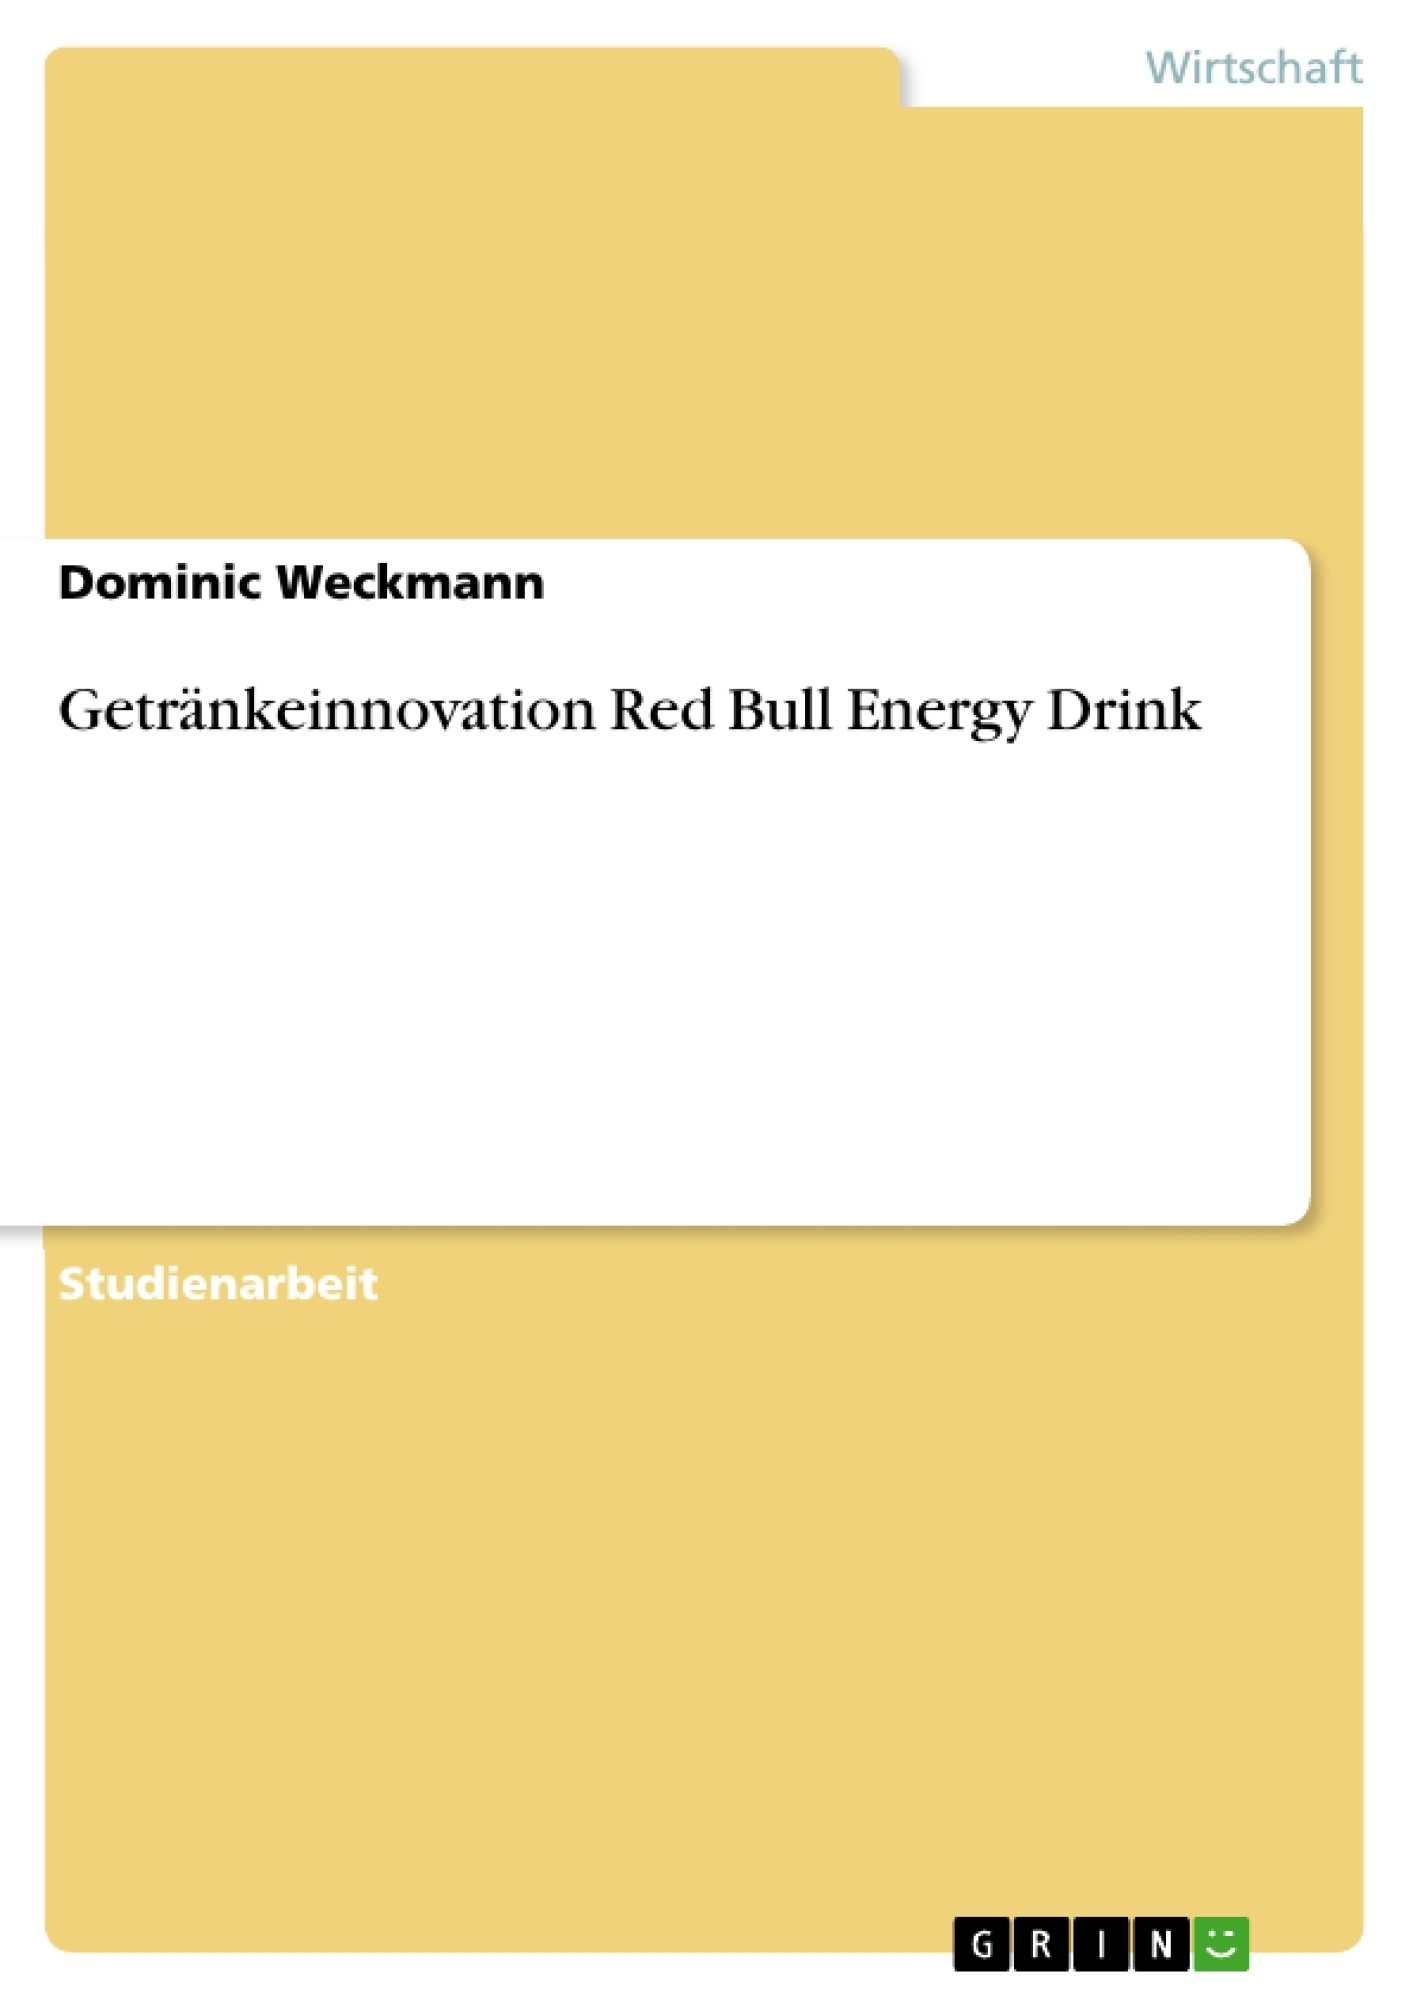 Titel: Getränkeinnovation Red Bull Energy Drink